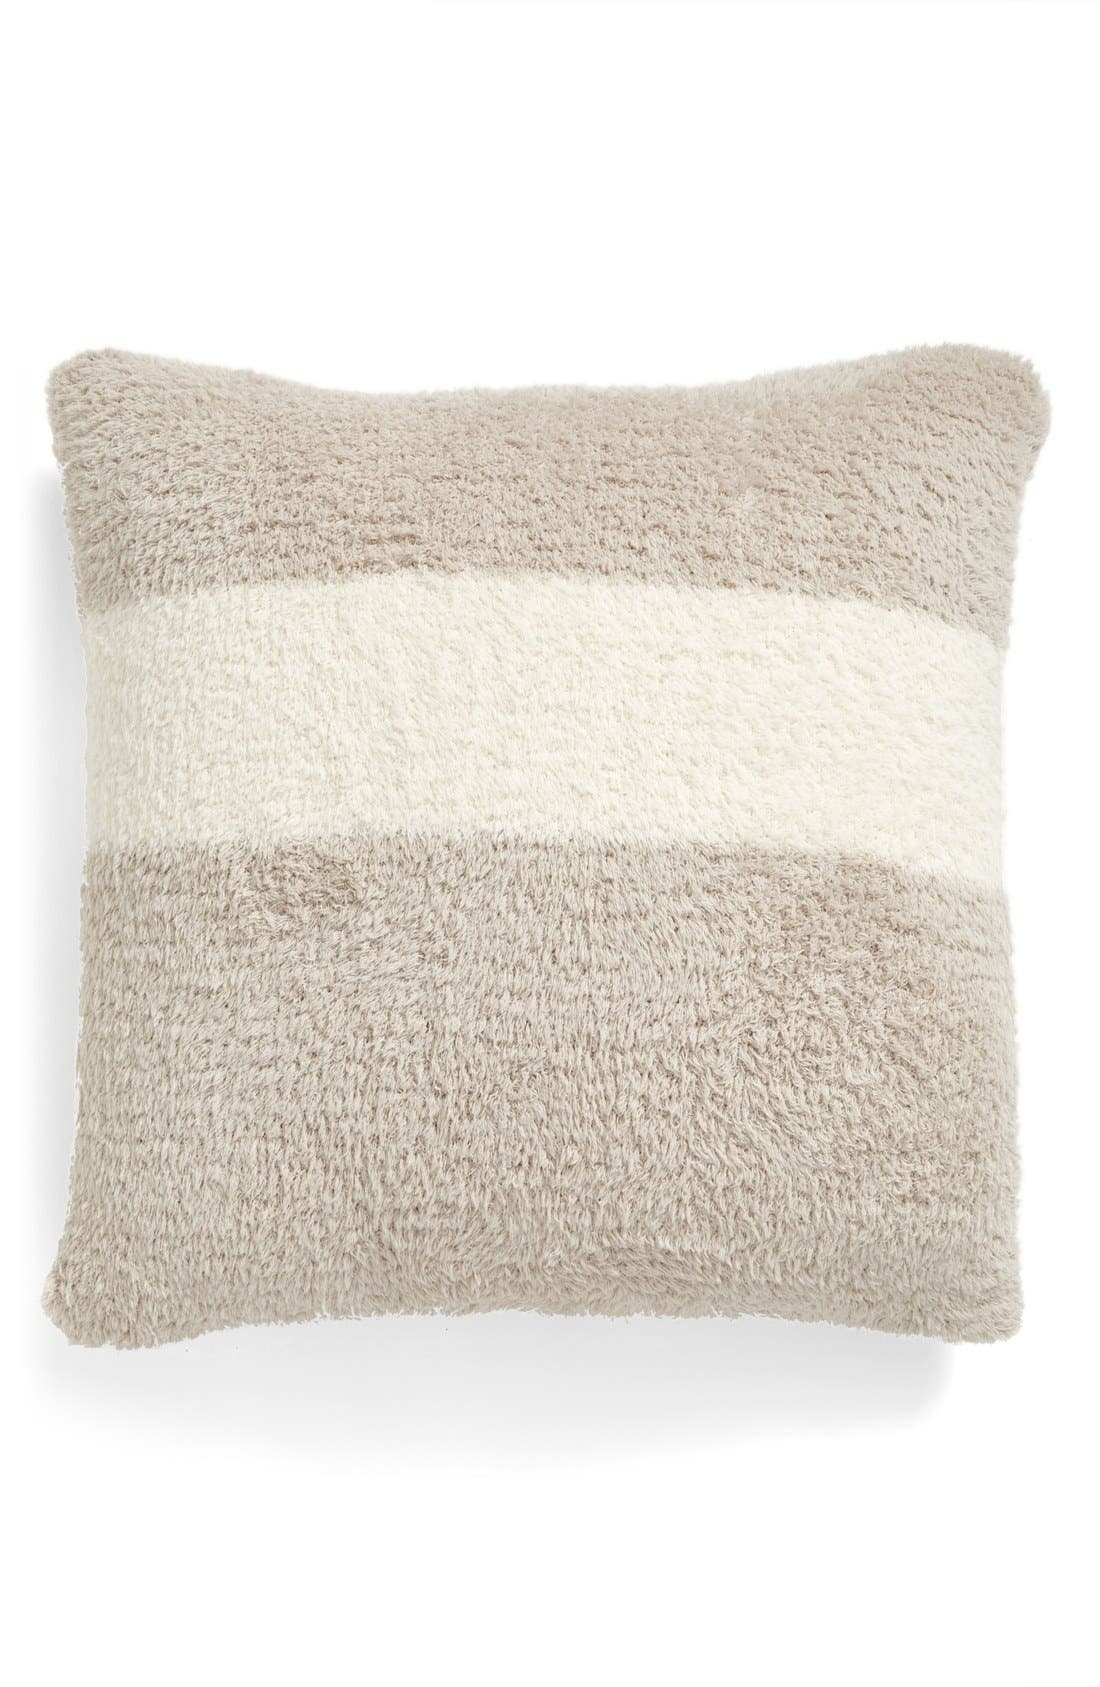 Main Image - Barefoot Dreams® CozyChic® Stripe Pillow